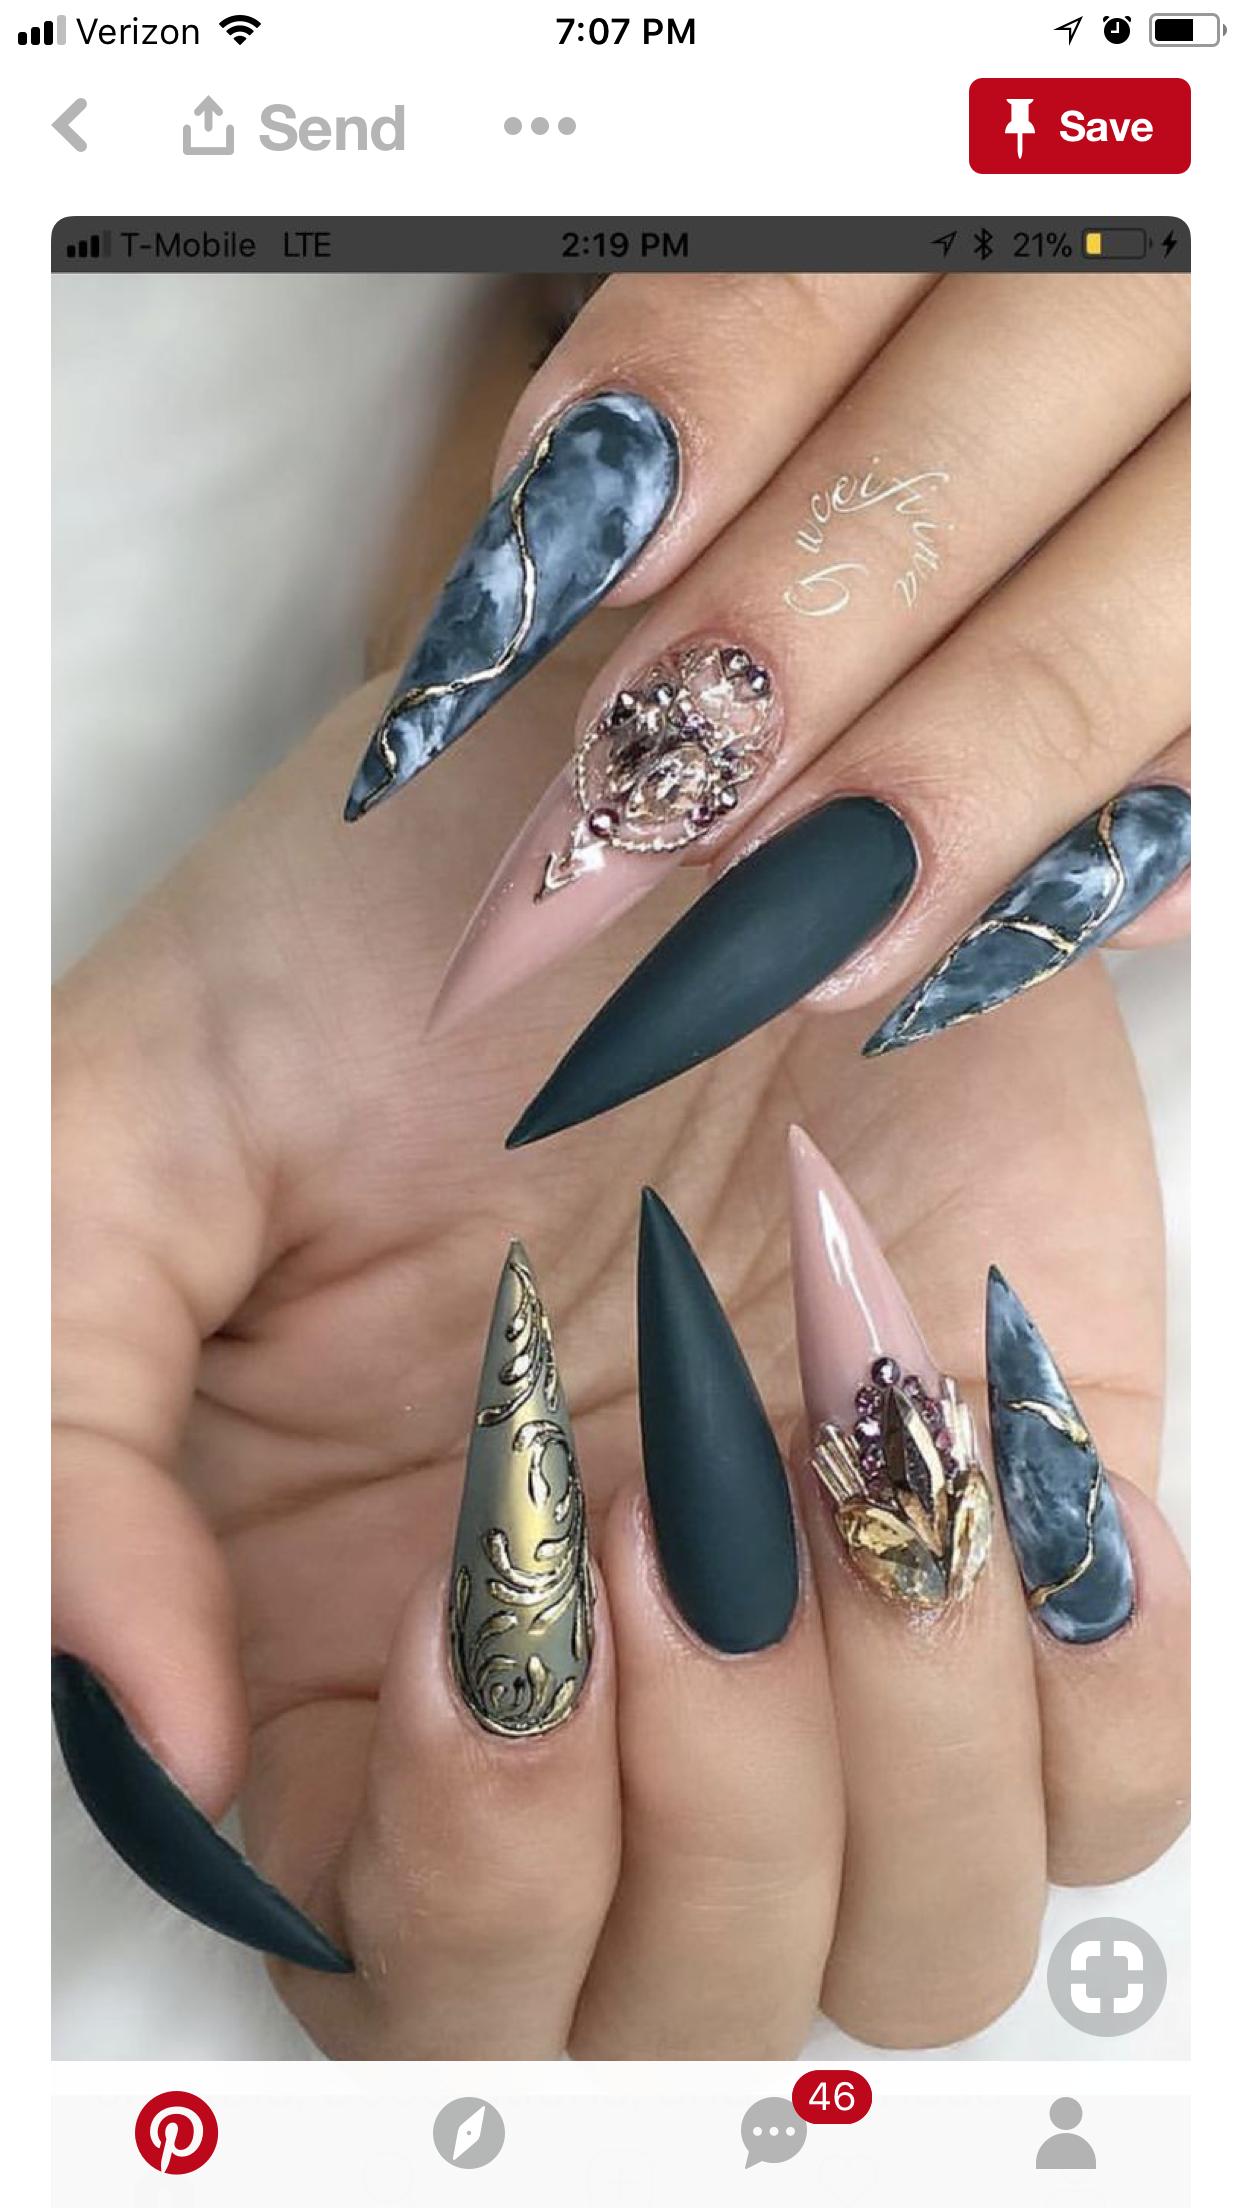 Pin by Karen Gonzalez on Nails | Pinterest | Teal nail designs, Nail ...